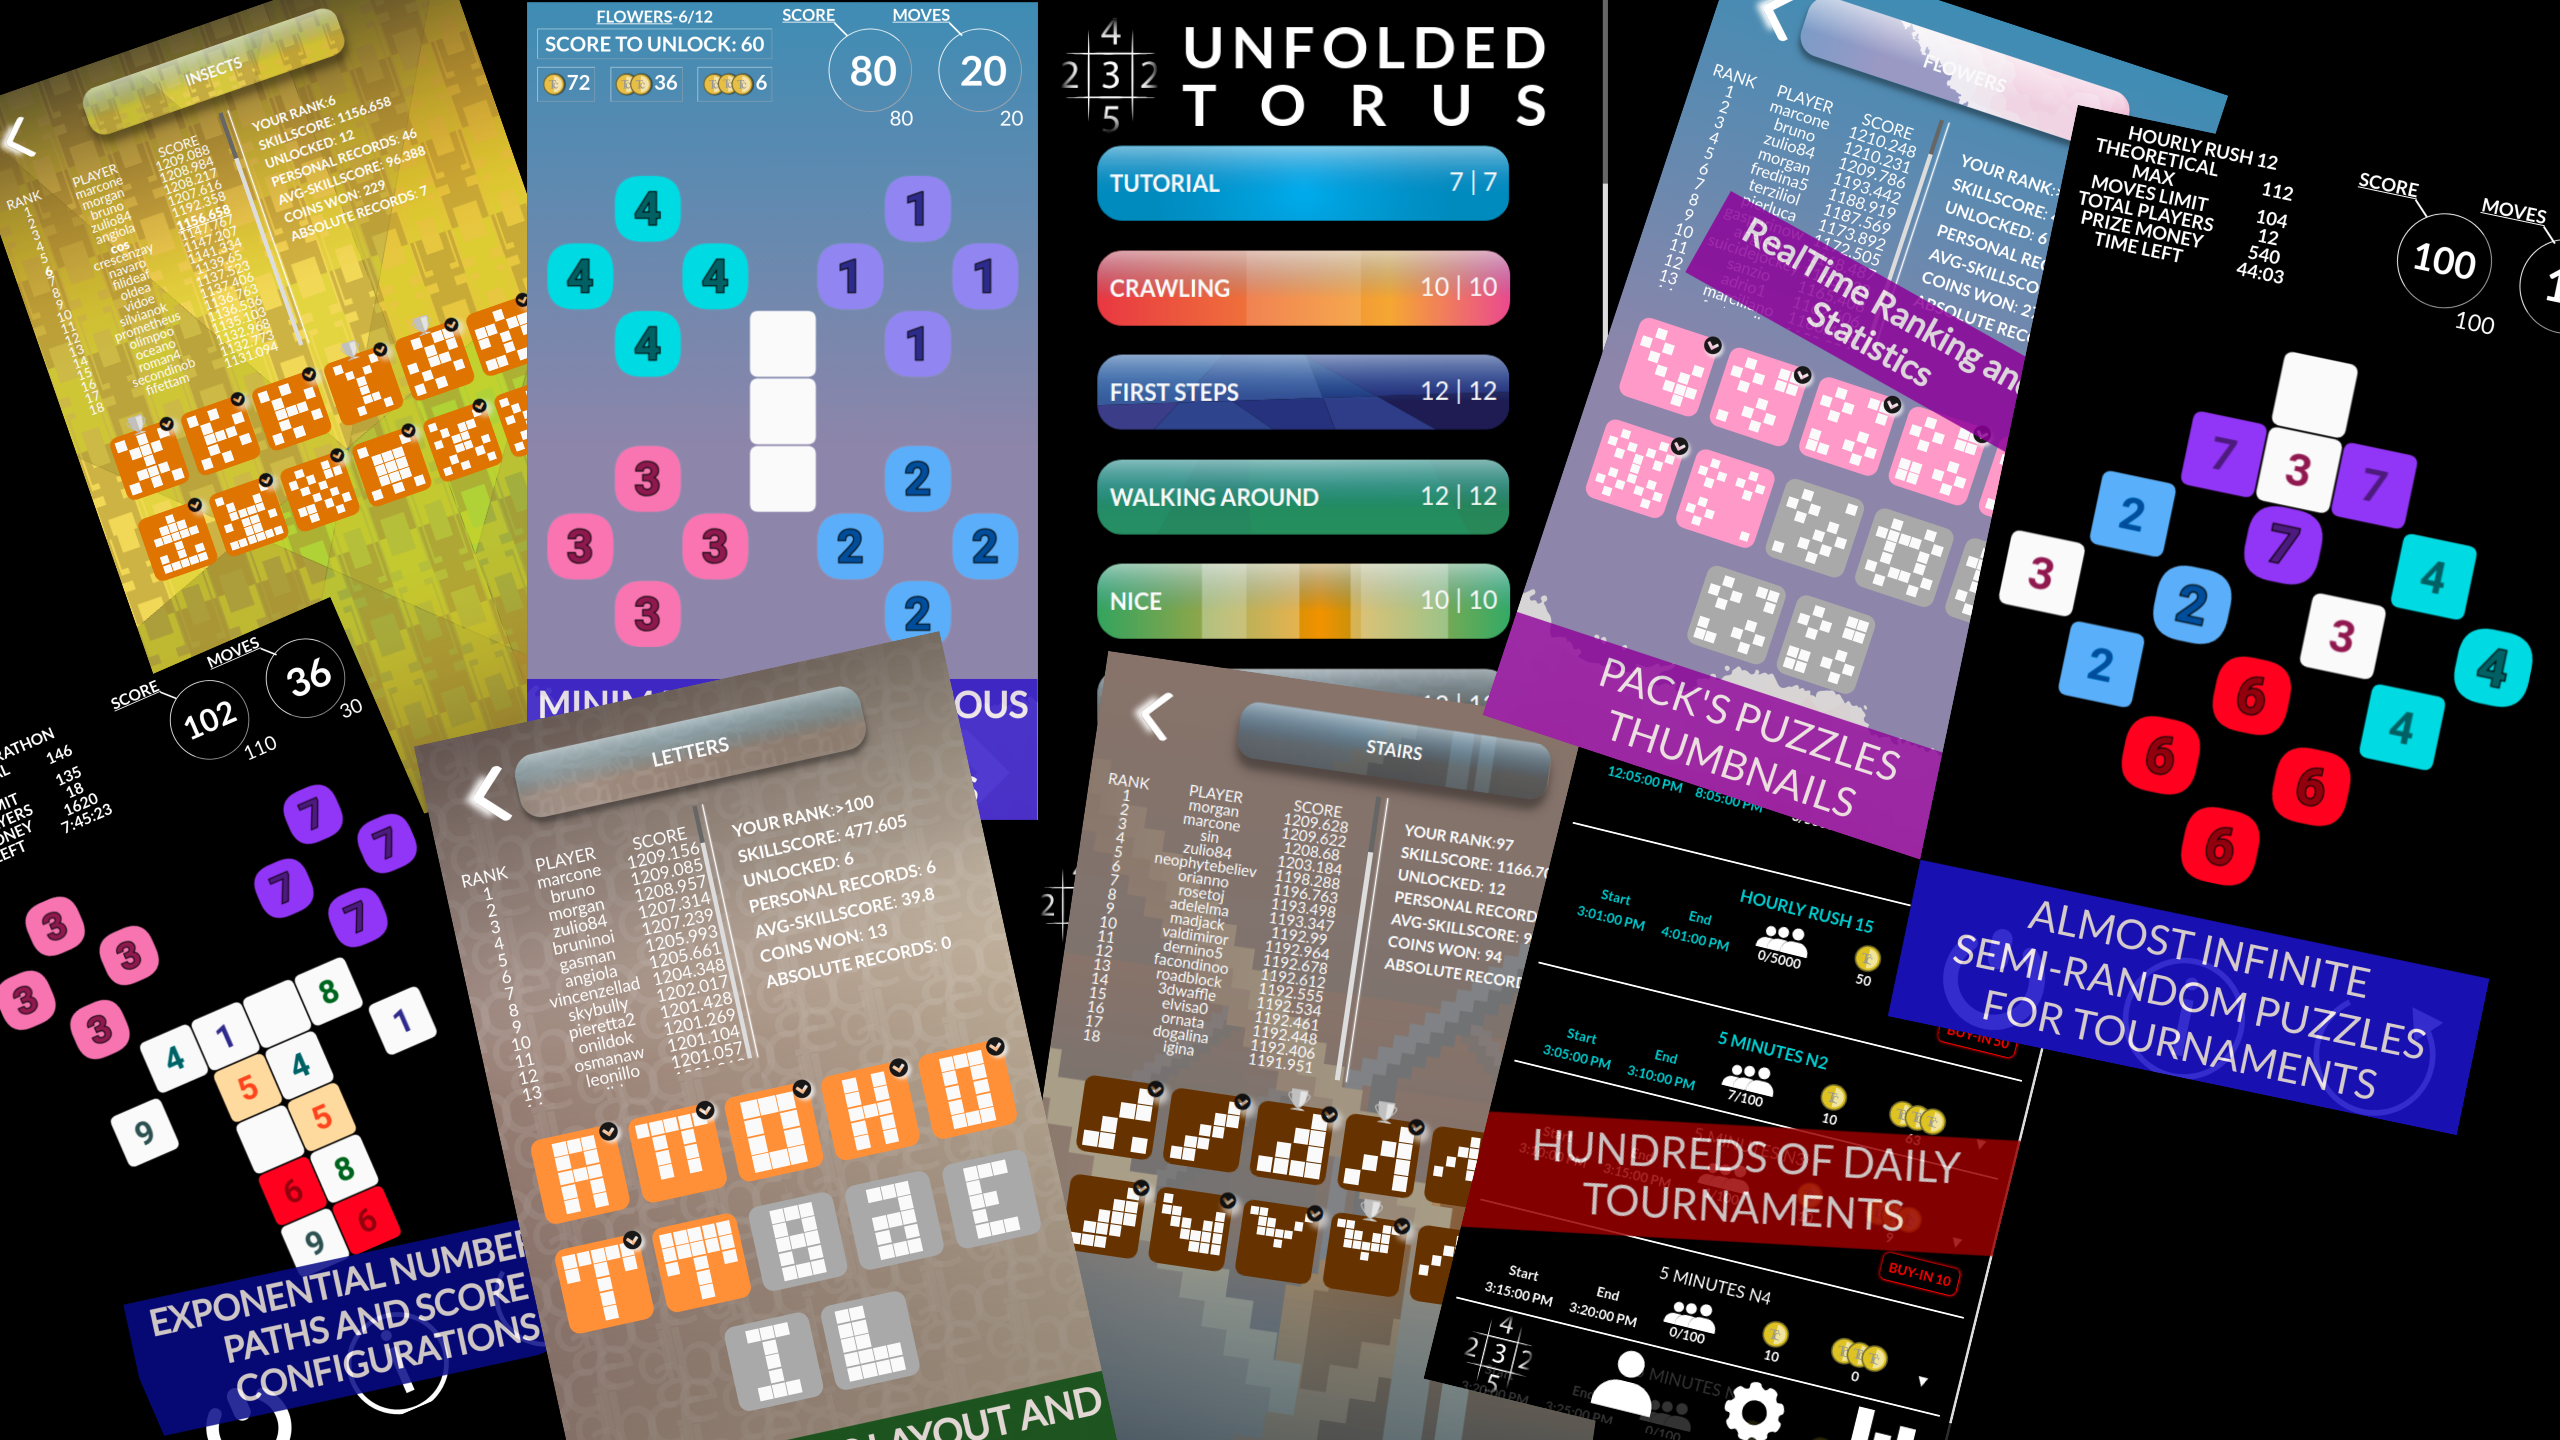 Unfolded Torus a new challenging brain teaser news - Indie DB